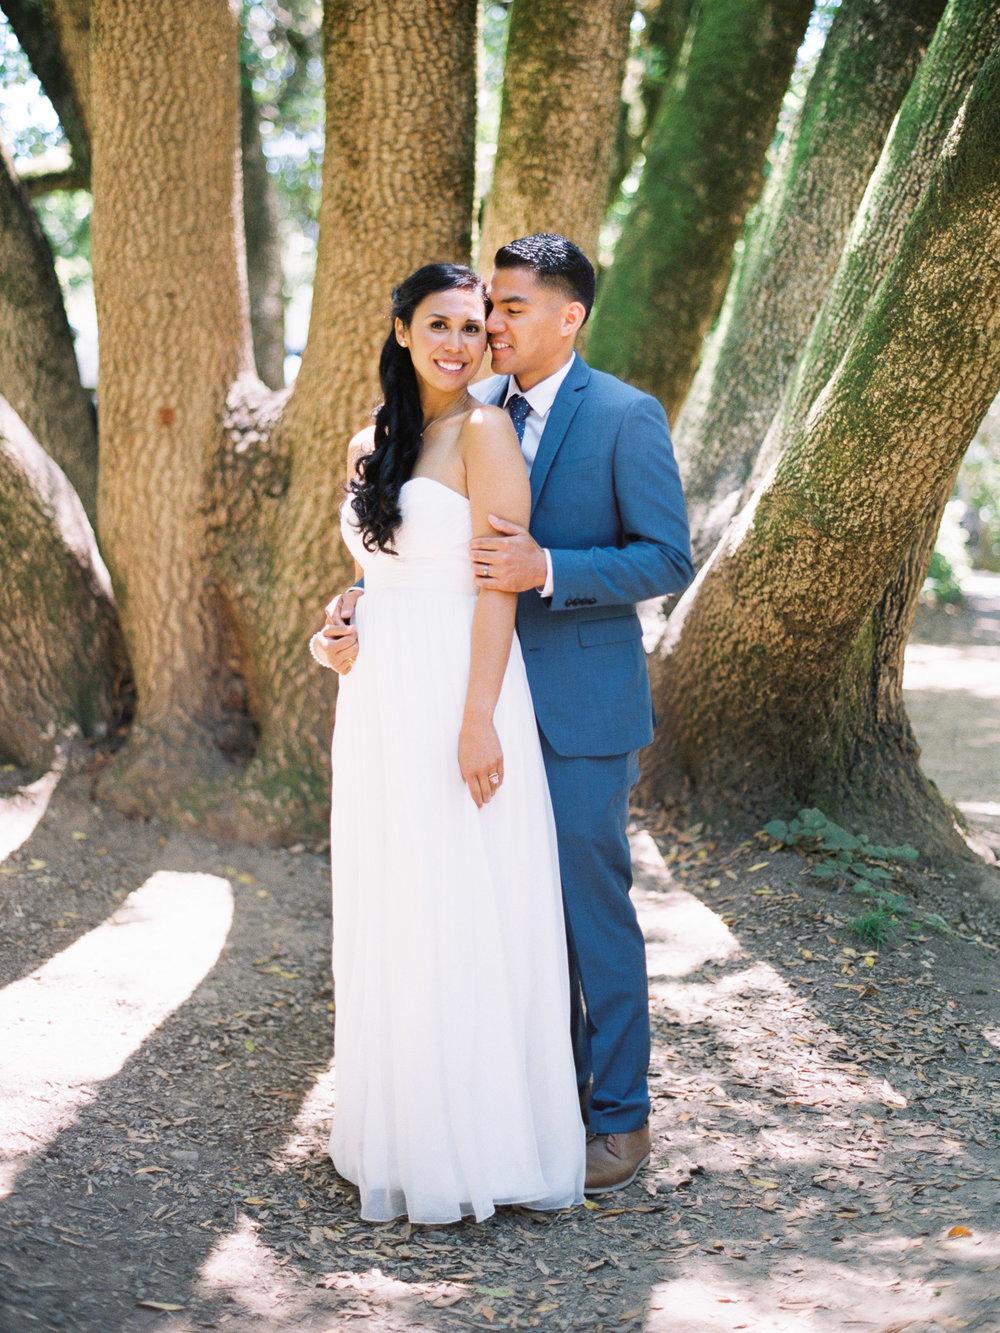 060Wedding+Photo+Video+Company+Luxuary+Weddings+Adventurour+Elopements.jpg